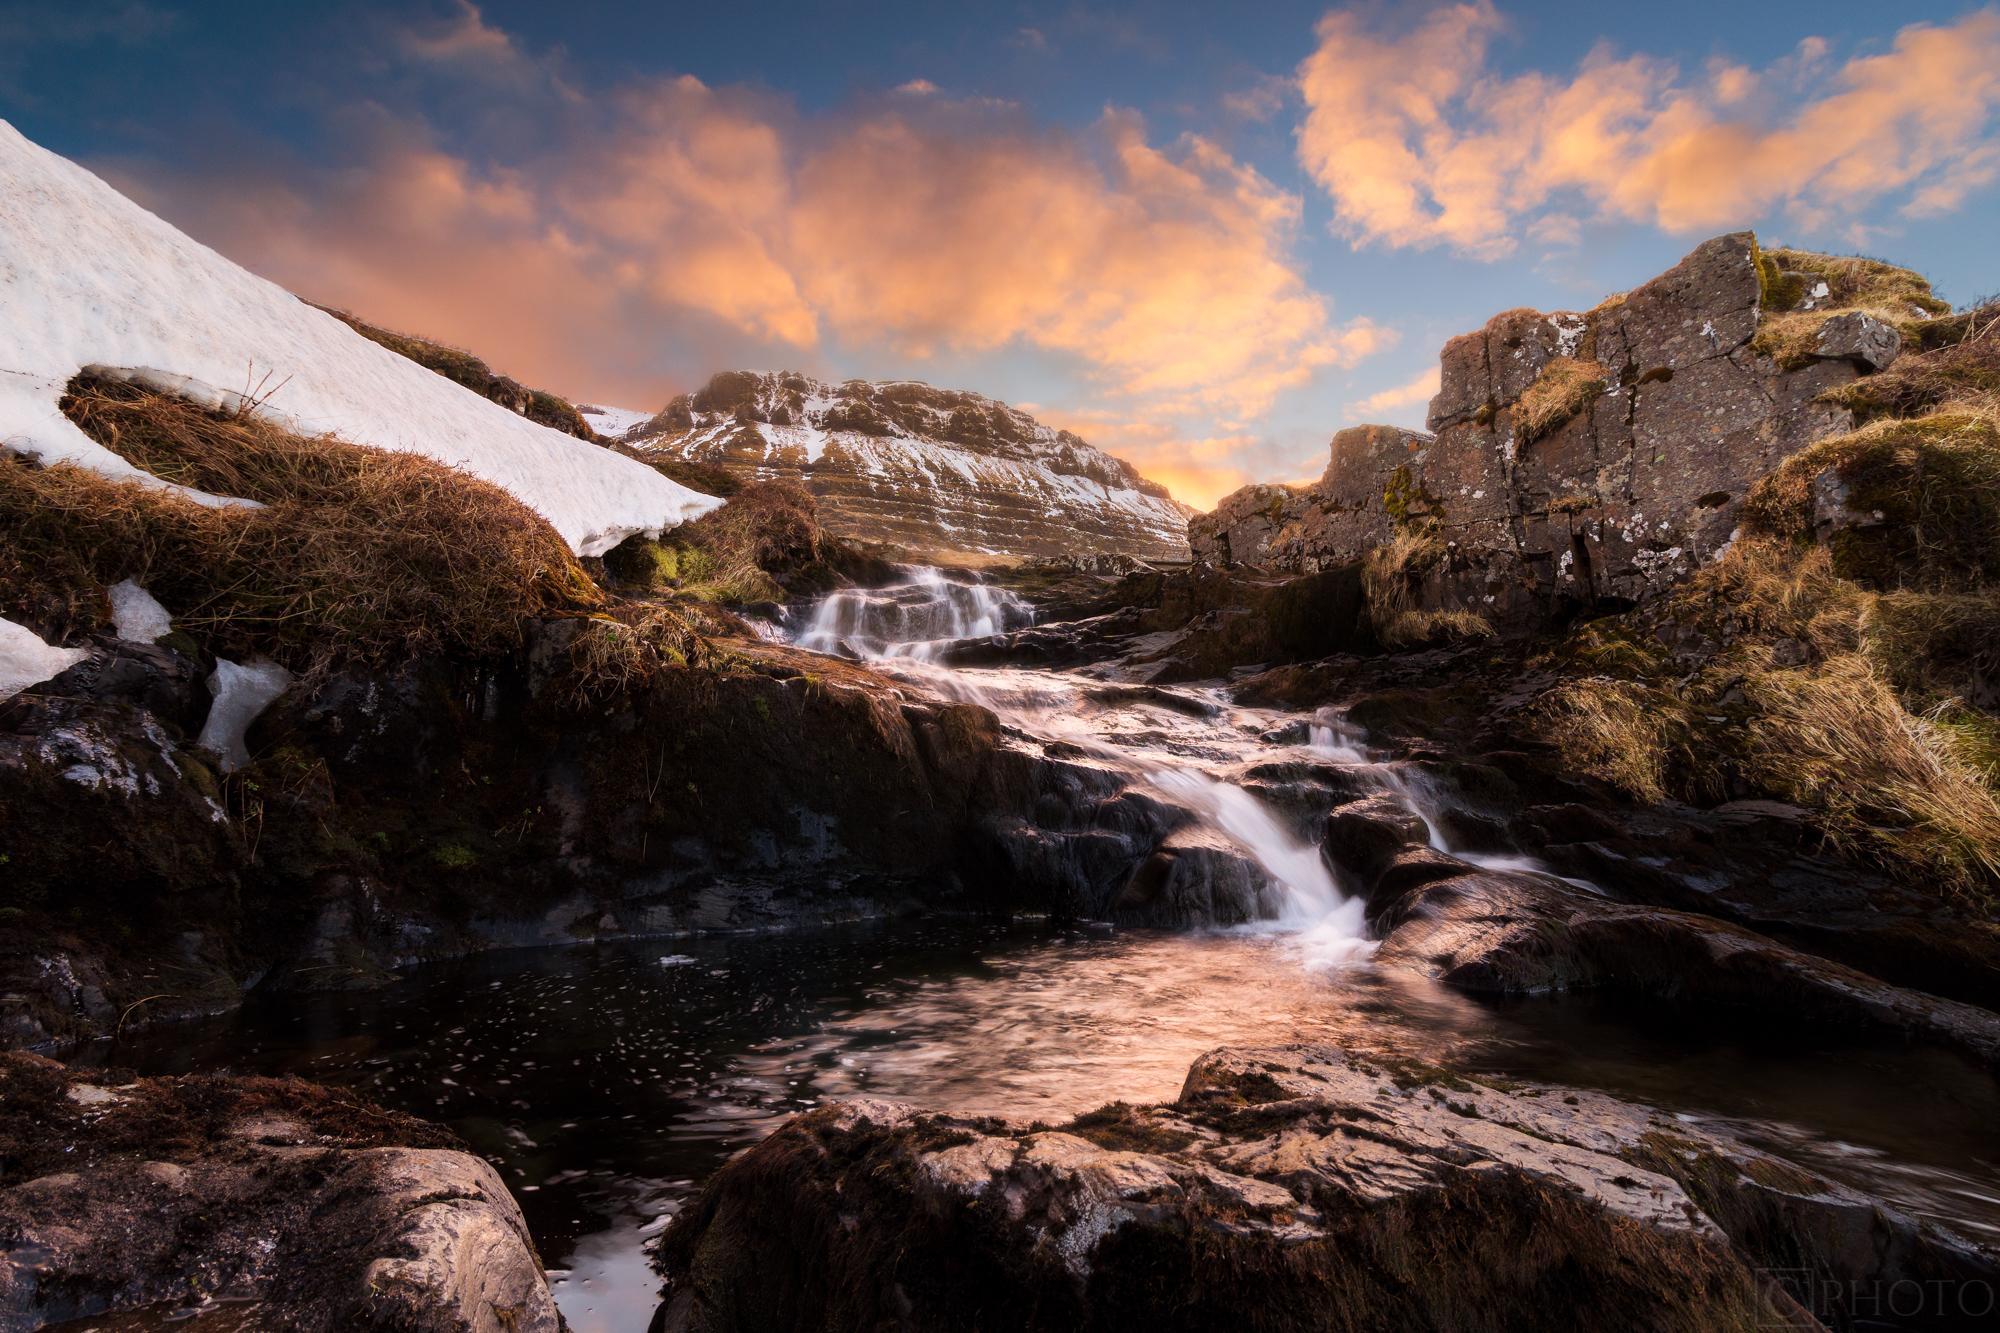 The Waterfalls of Kirkjufell